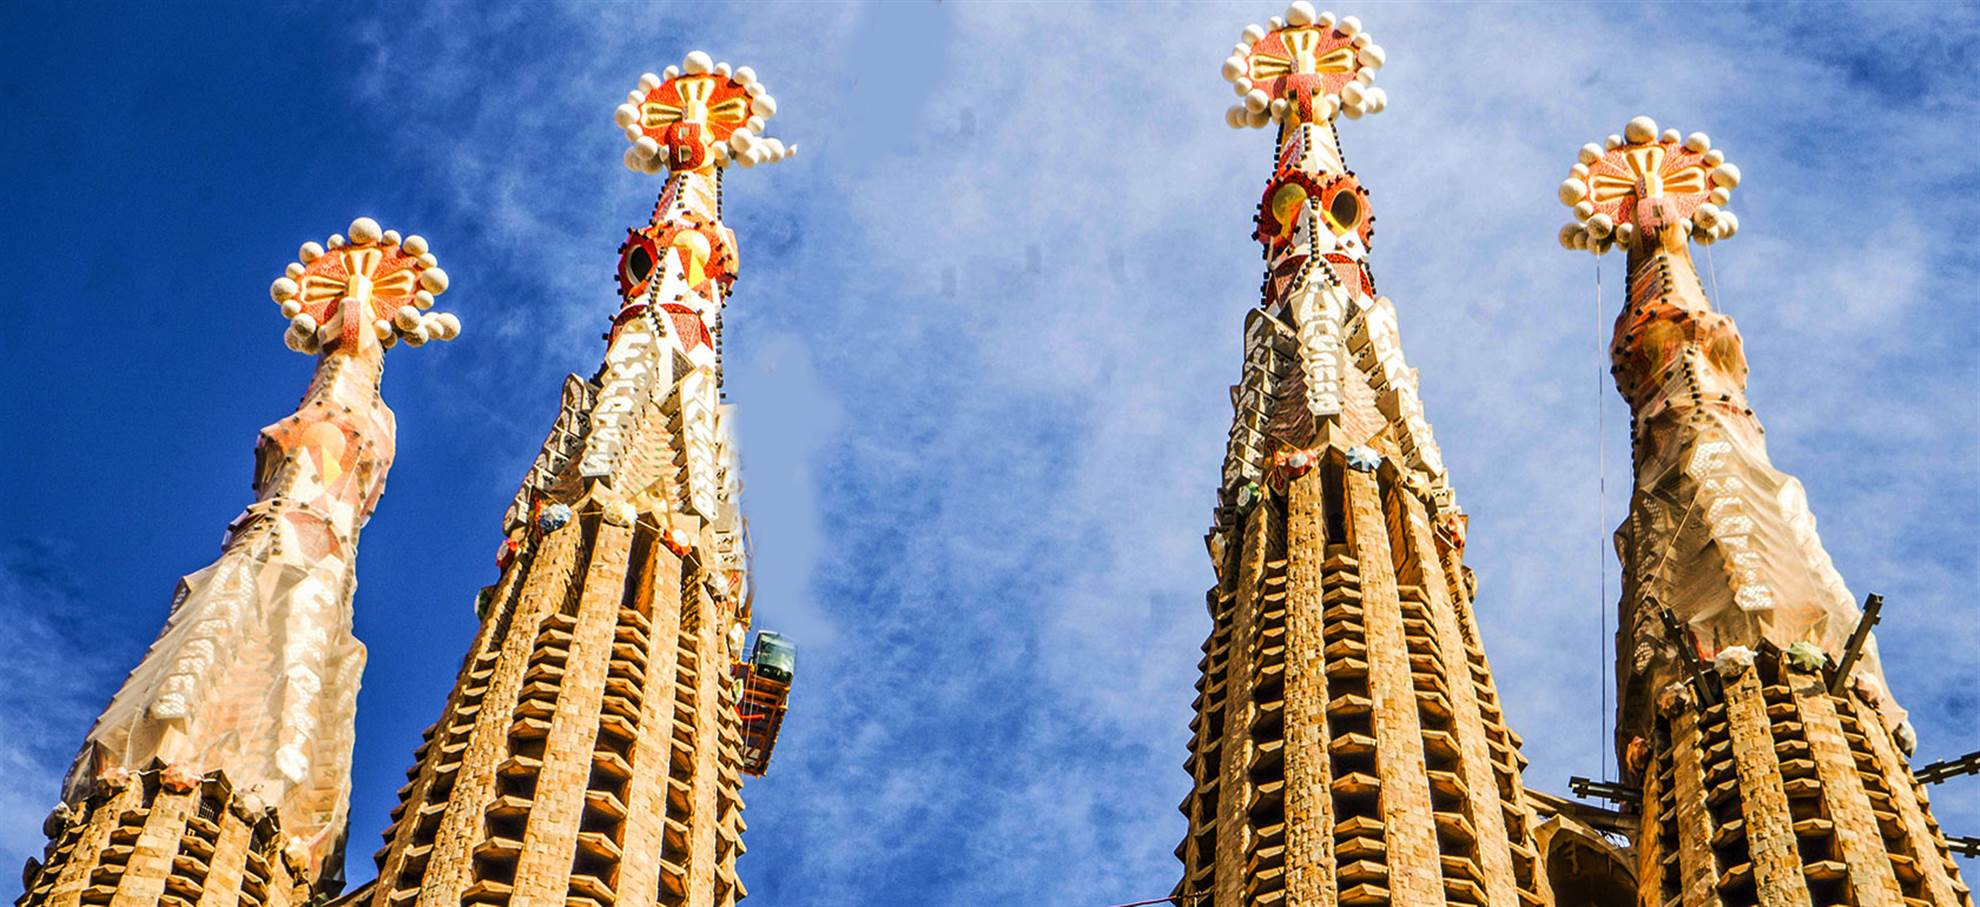 Biglietti Sagrada Familia + Audioguida + Visita alle Torri